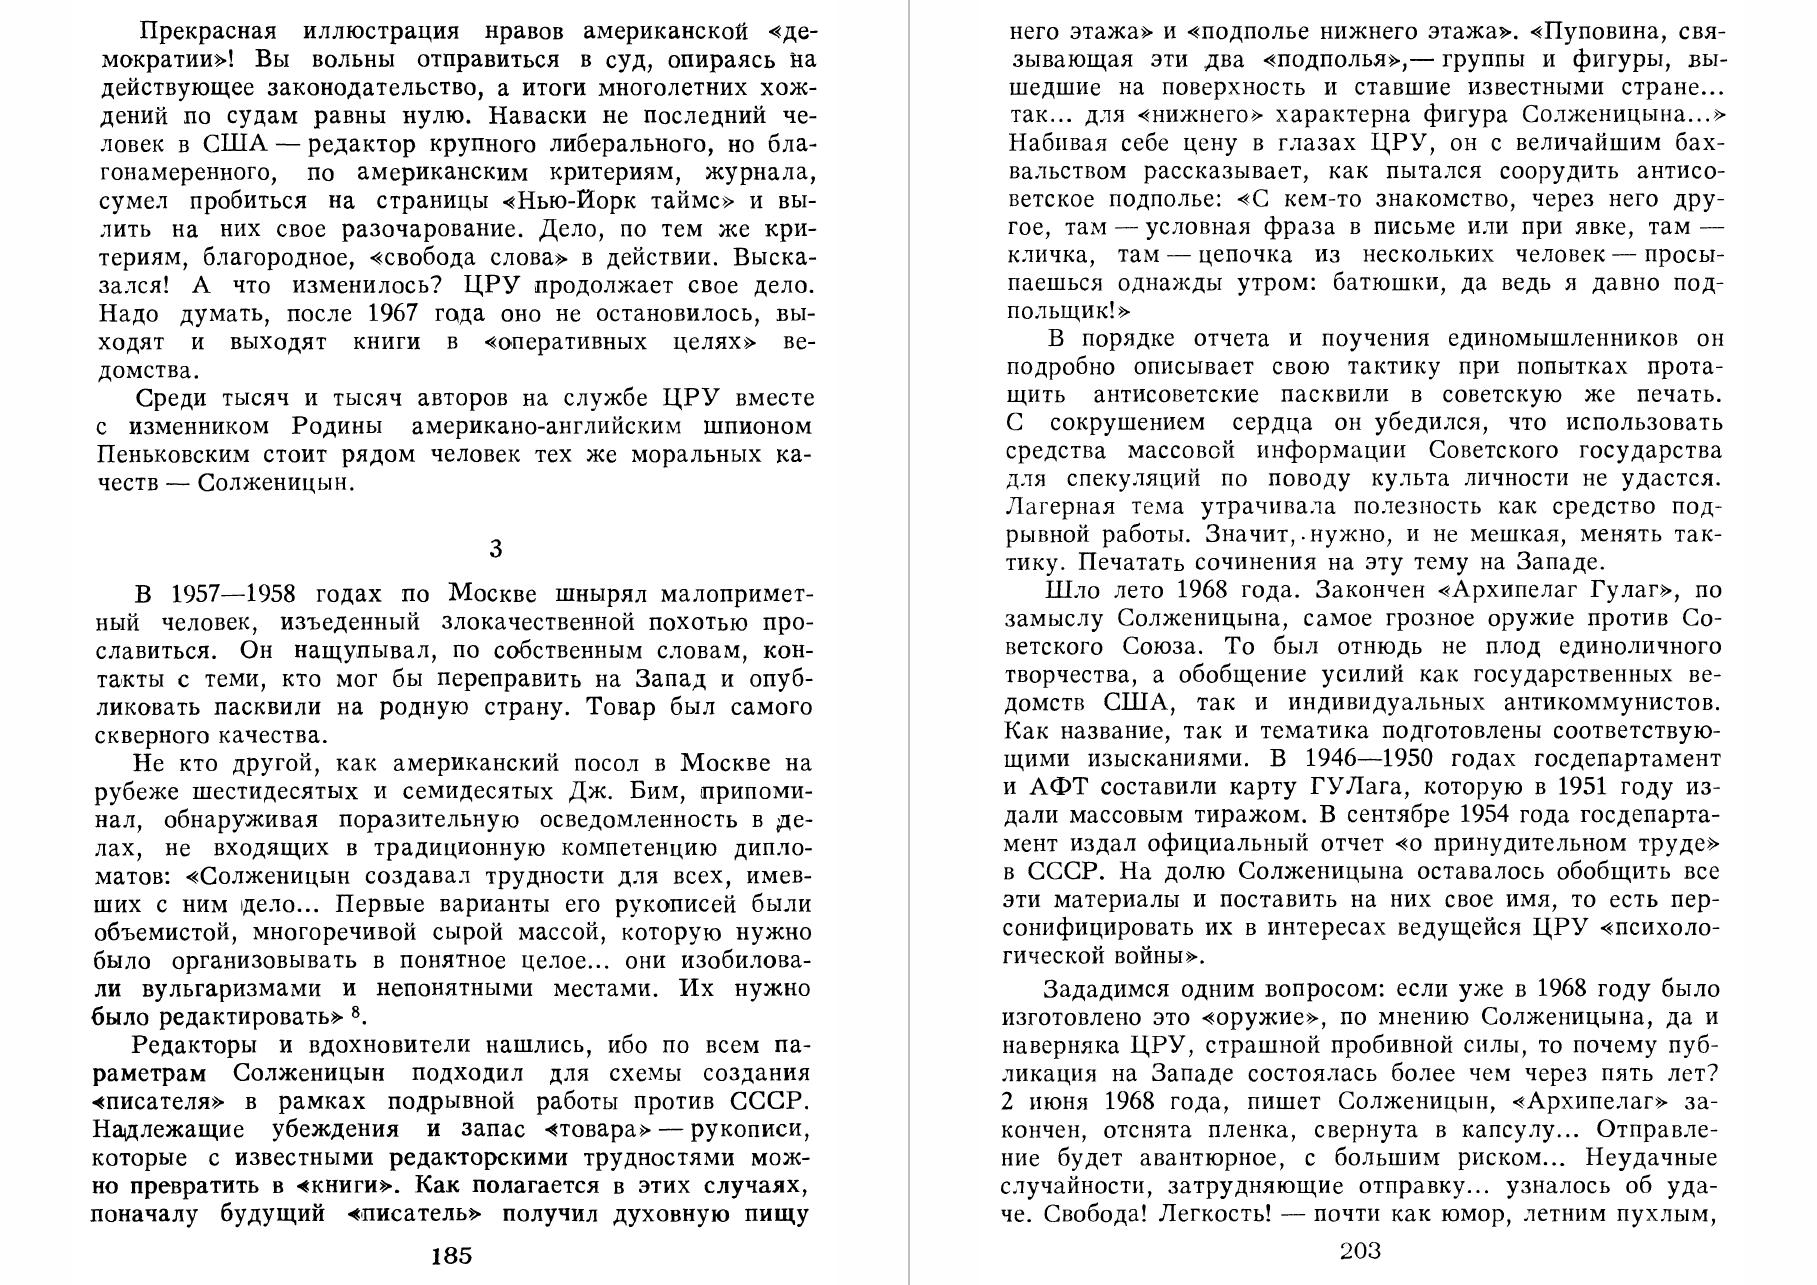 Яковлев Николай. ЦРУ против СССР, с.185, 203